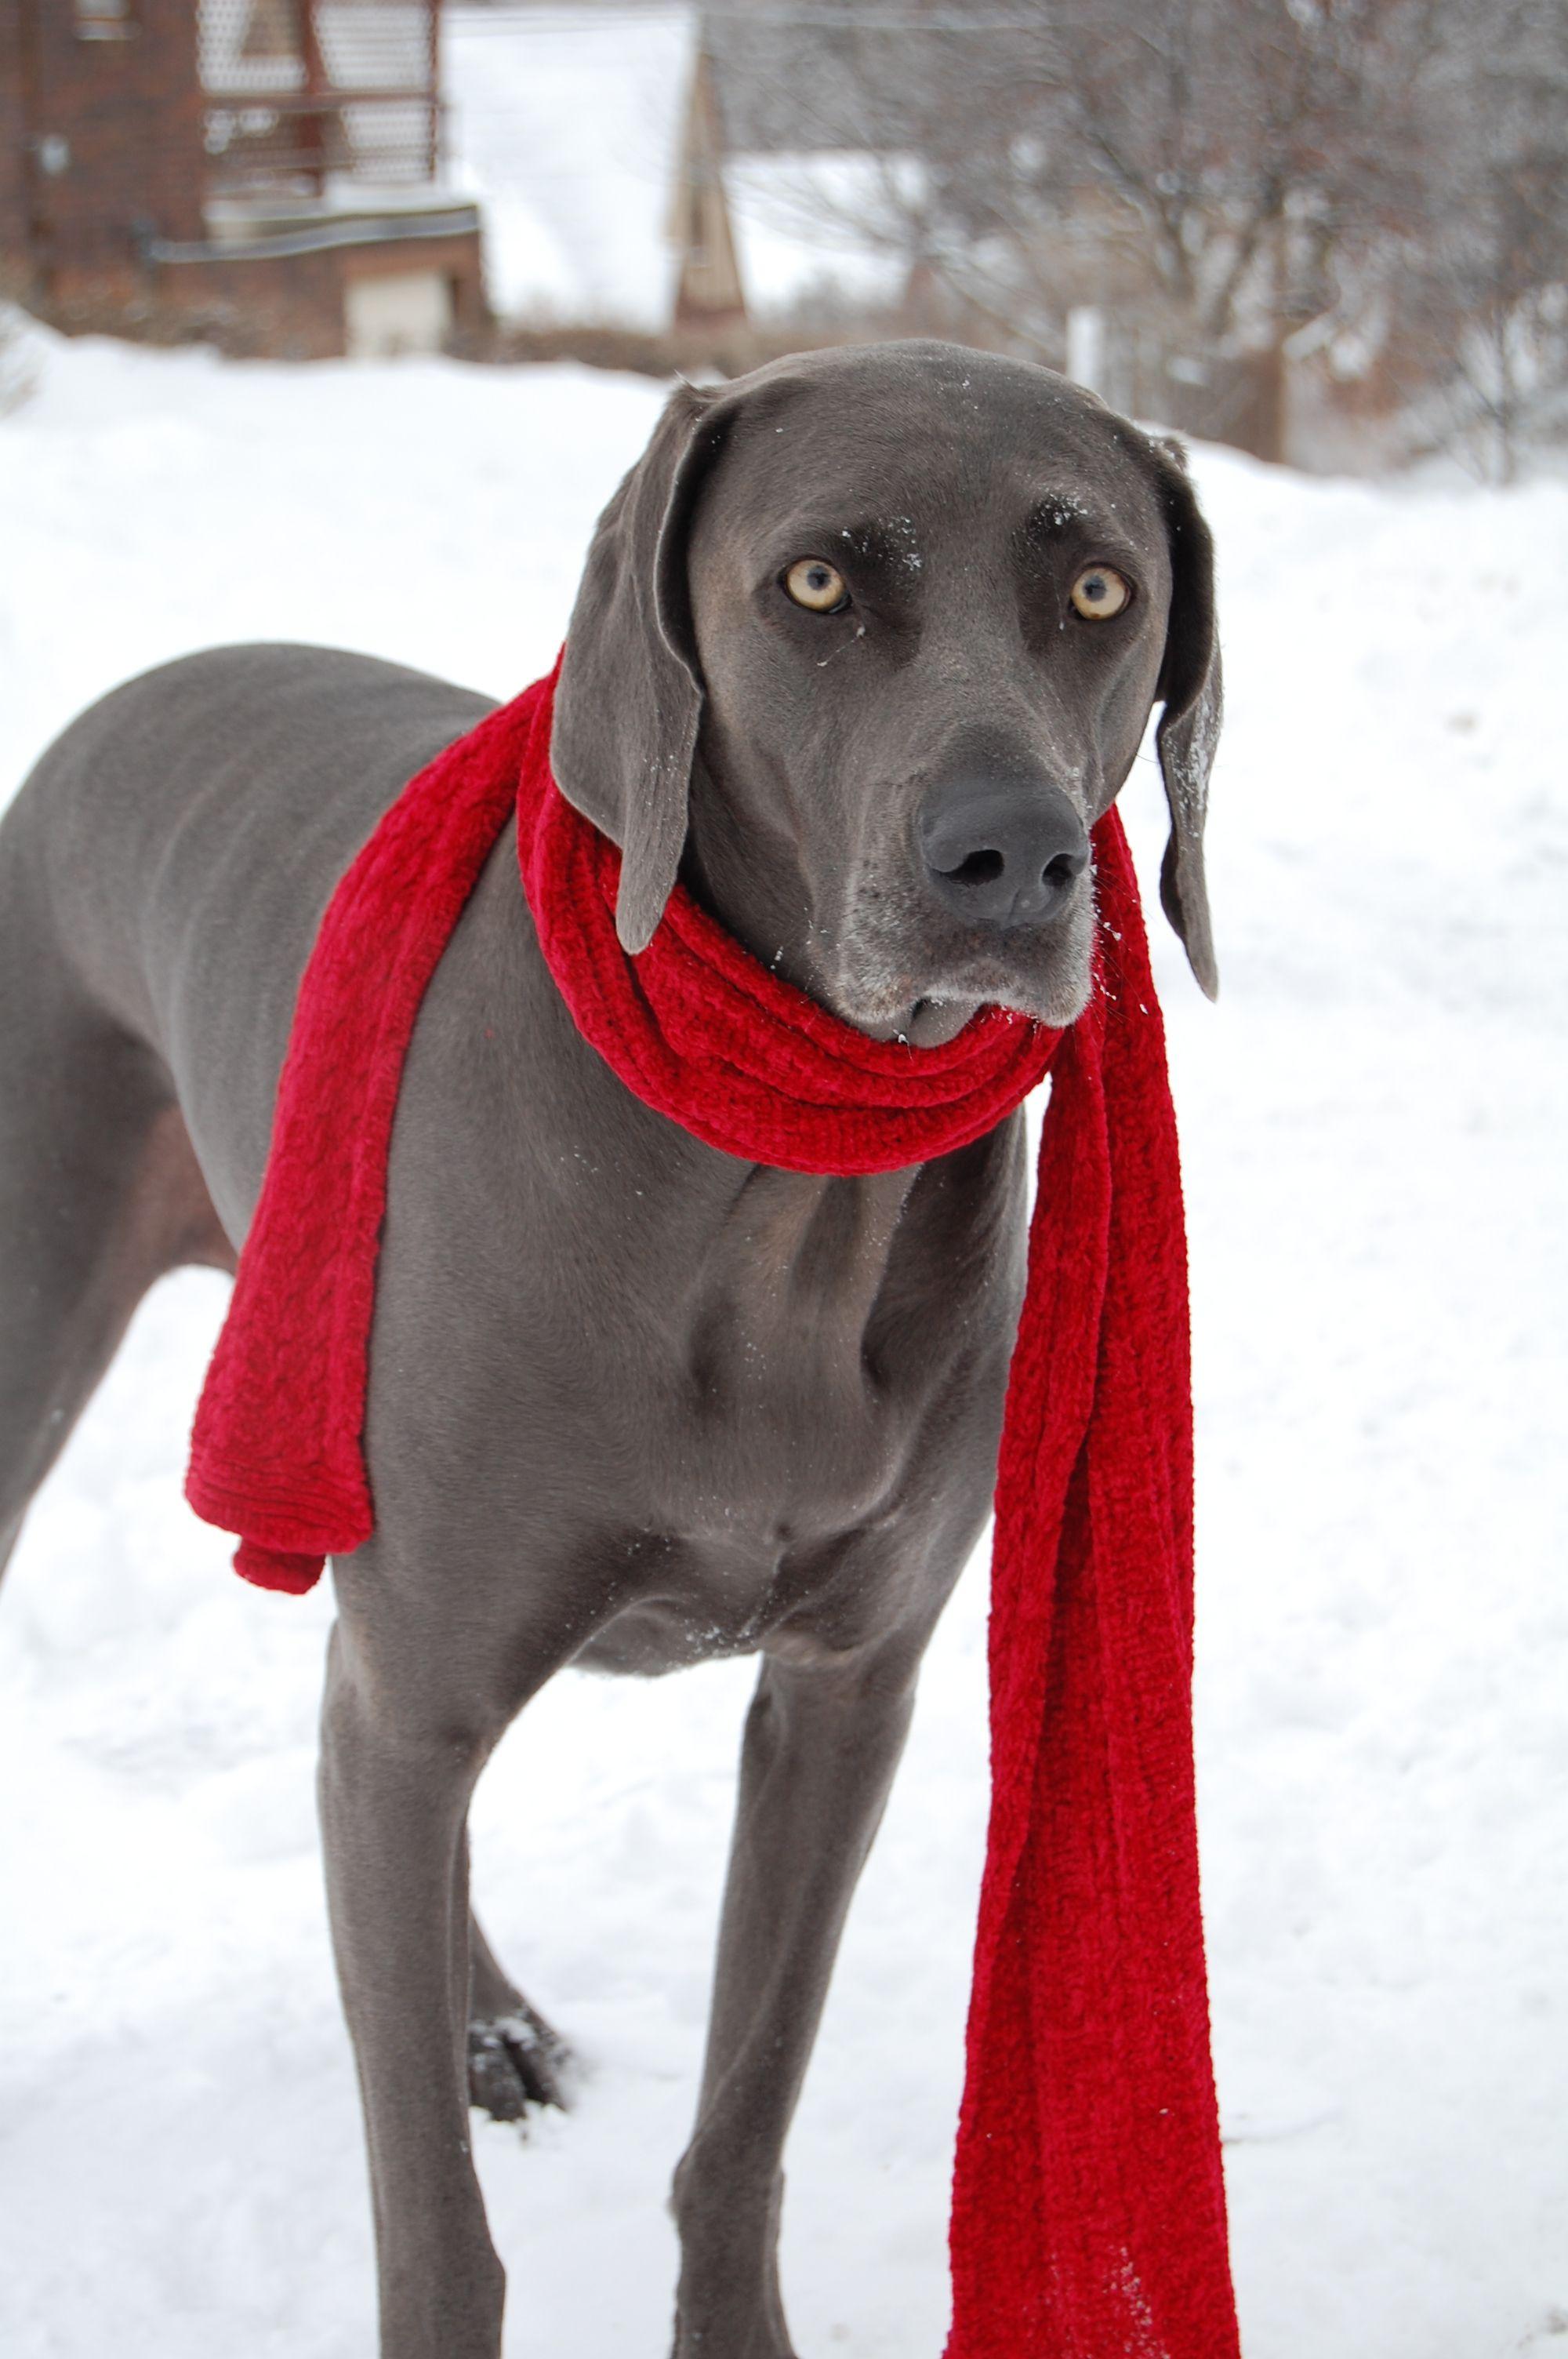 Winter weimaraner puppy dog holidaydogs holiday dogs winter weimaraner puppy dog holidaydogs nvjuhfo Image collections